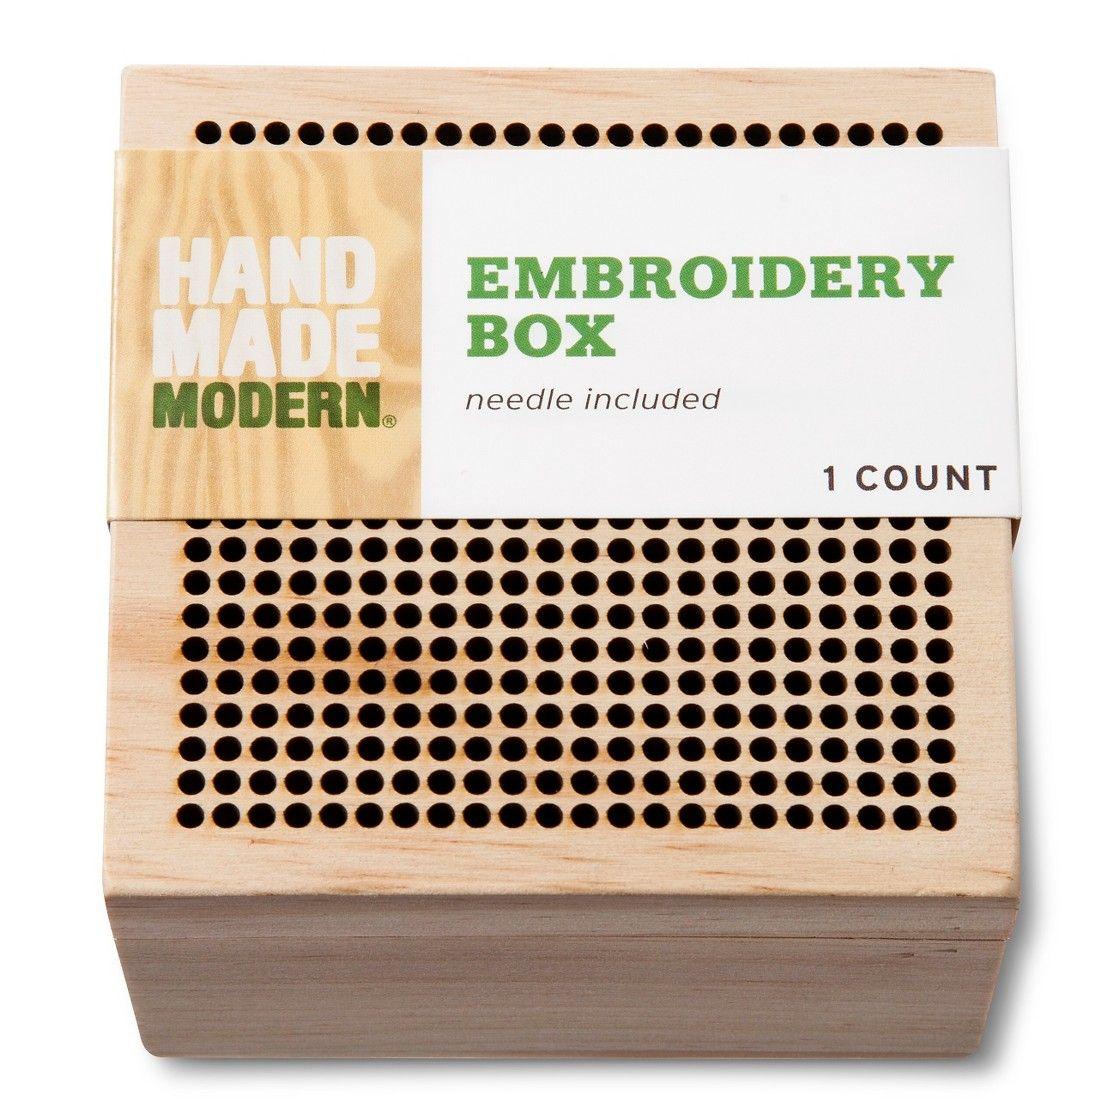 Hand Made Modern - Wood Grid Top Box